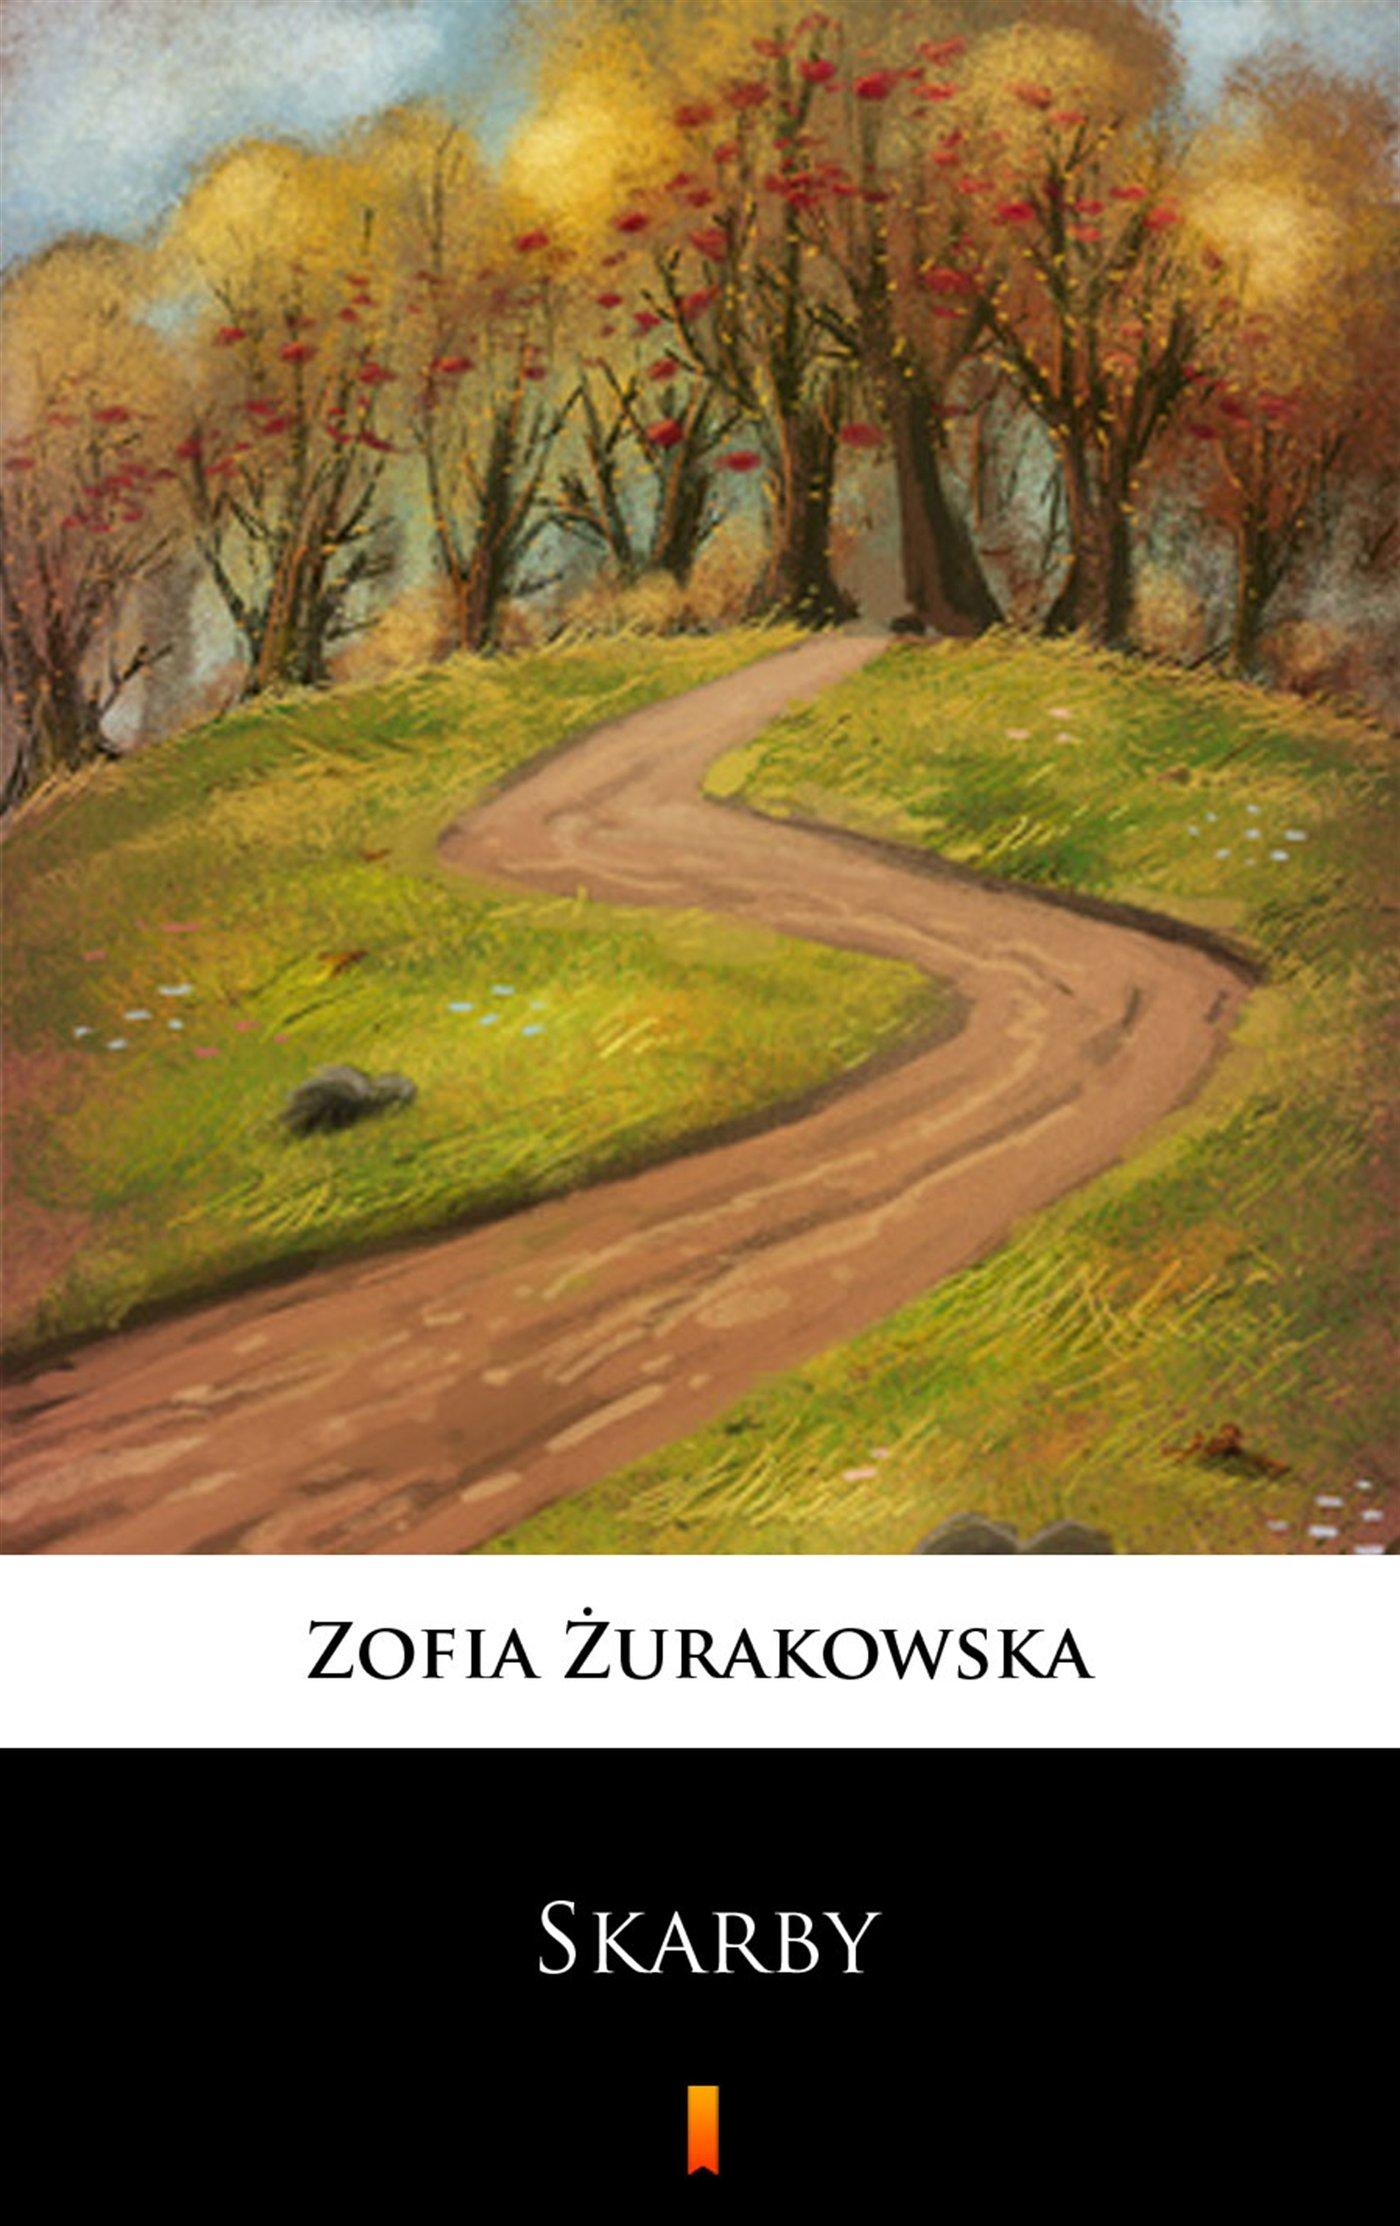 Skarby - Ebook (Książka EPUB) do pobrania w formacie EPUB